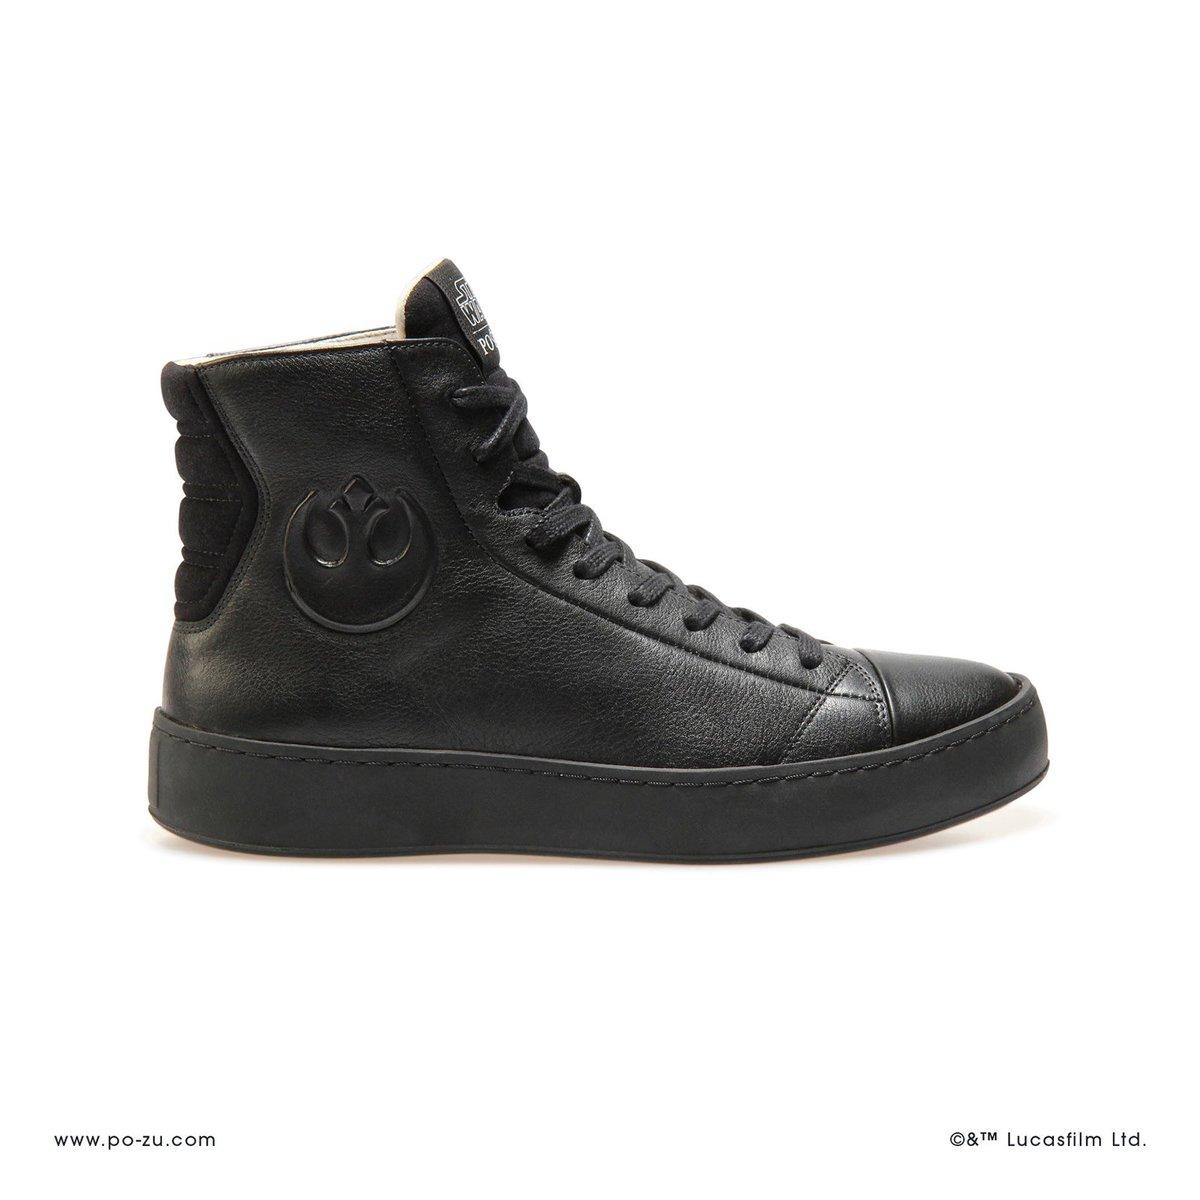 6c7e0098989 Po-Zu Shoes on Twitter